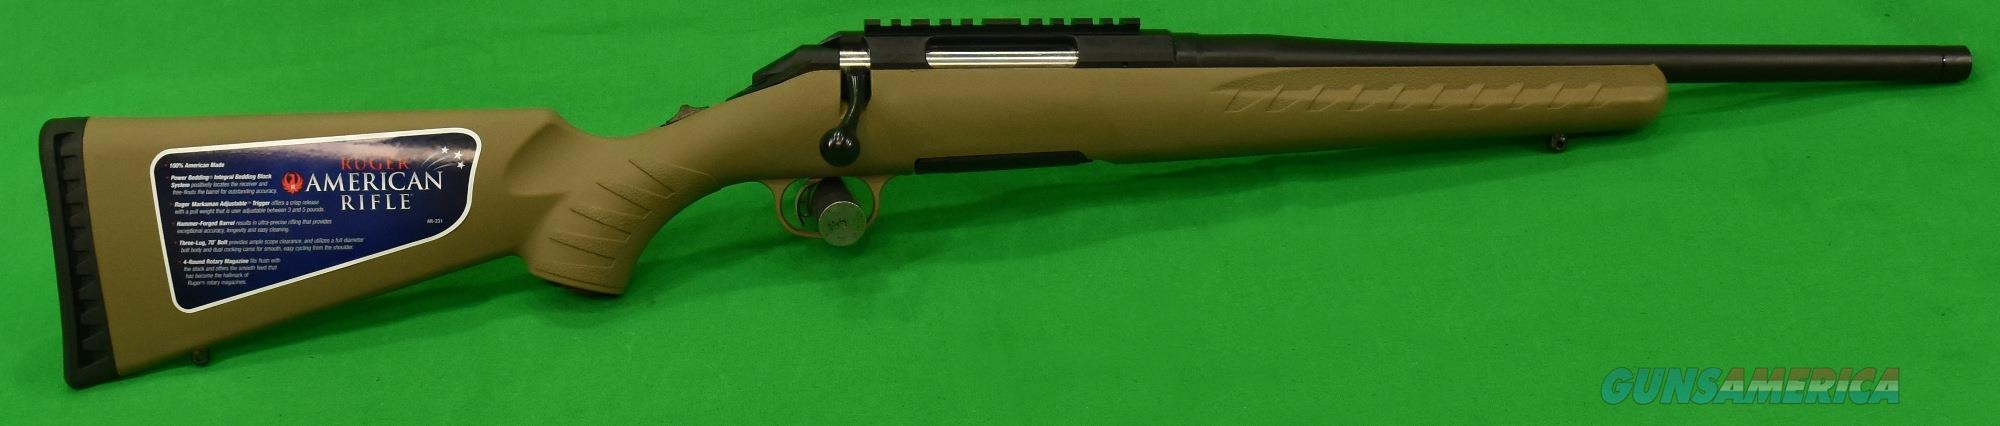 American Rifle Ranch 5.56mm 16.12In 6965  Guns > Rifles > Ruger Rifles > American Rifle